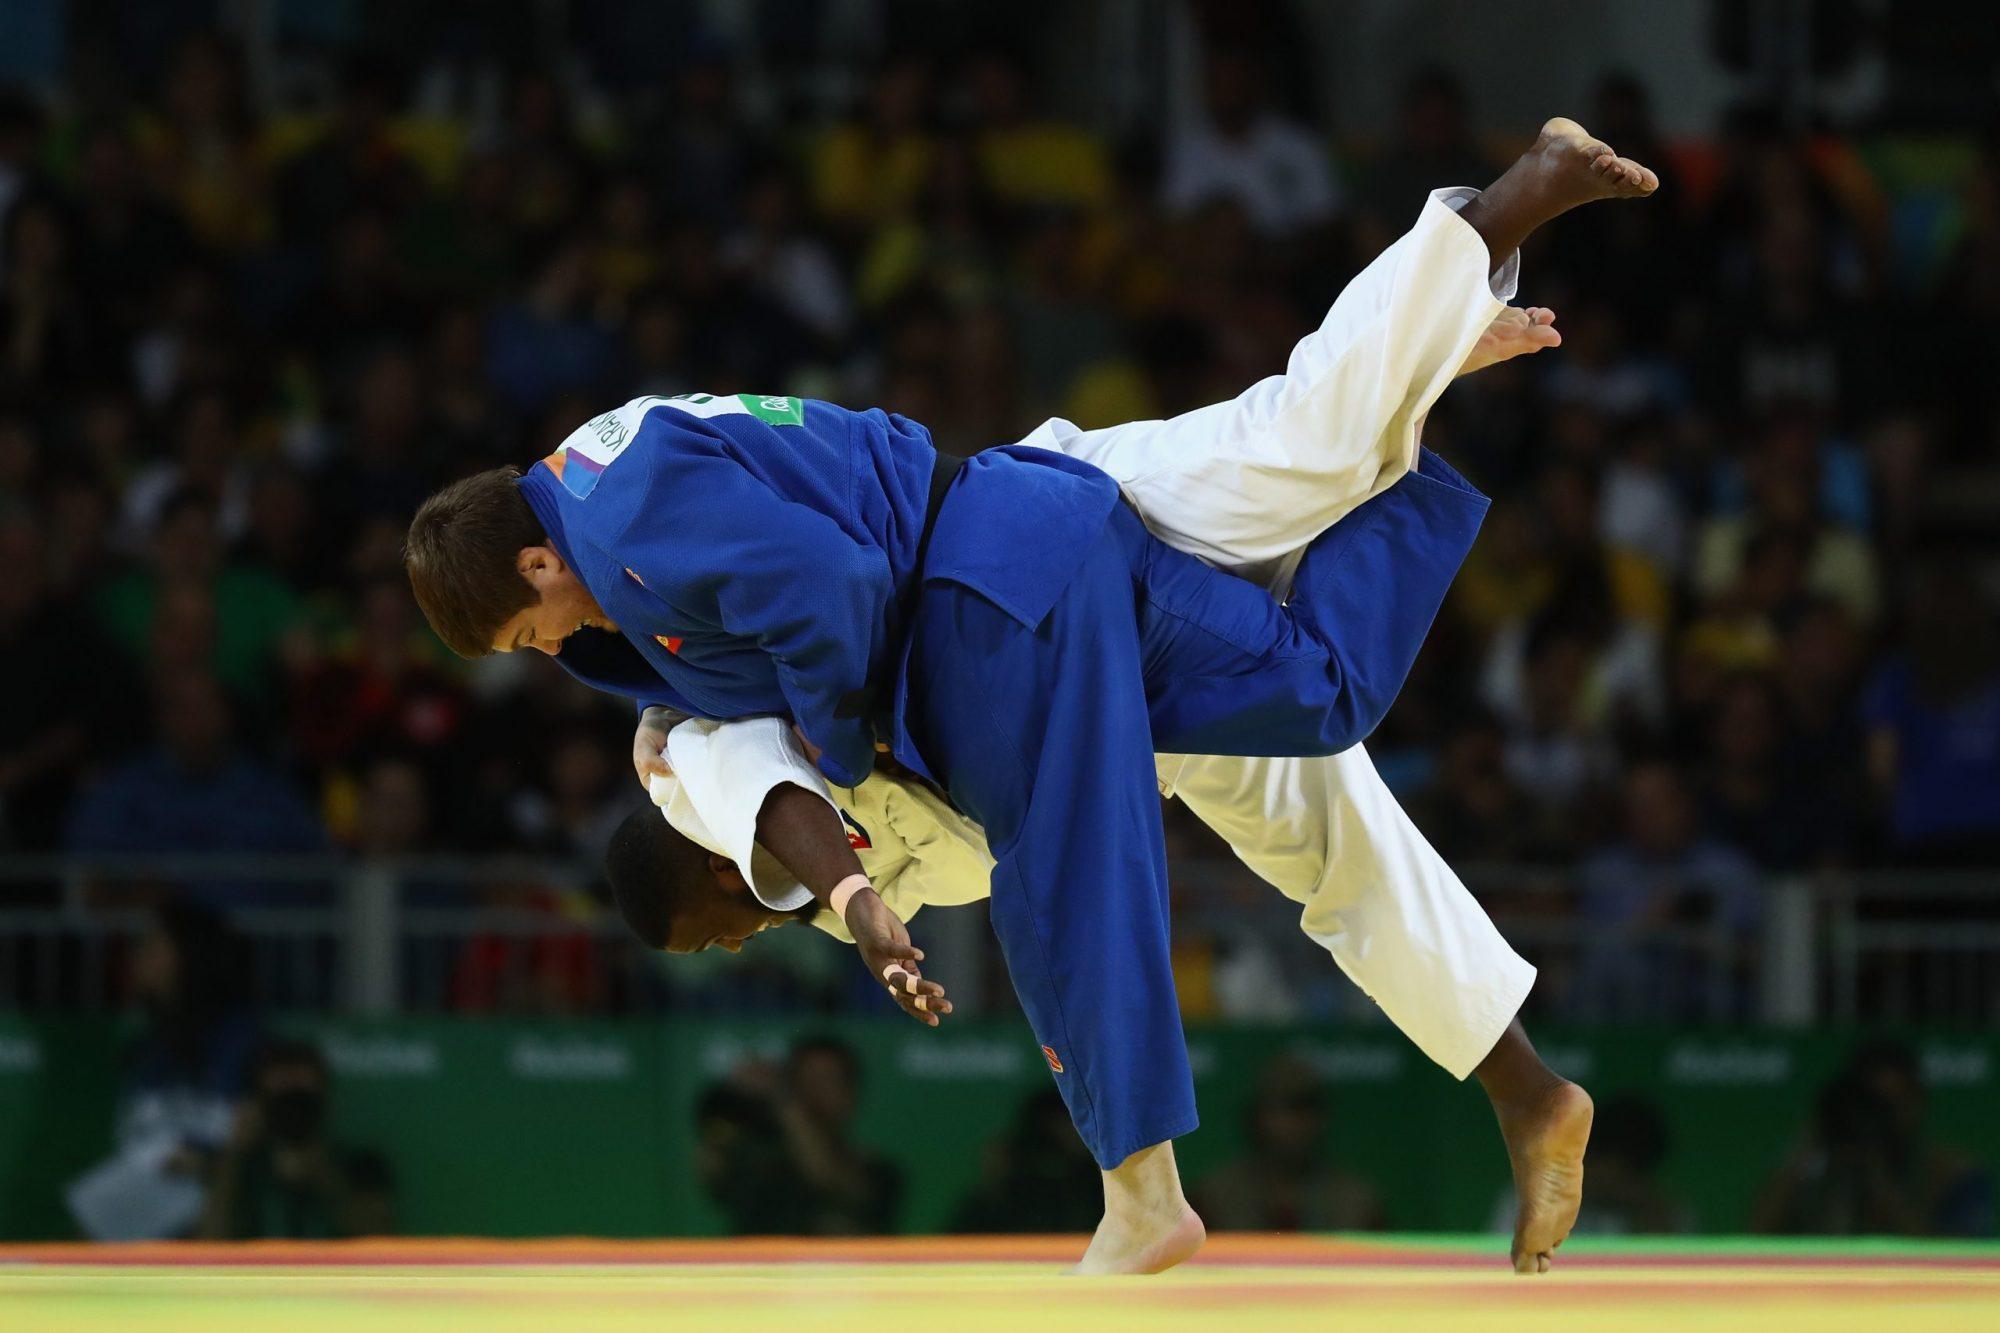 deux judoka en plein combat.